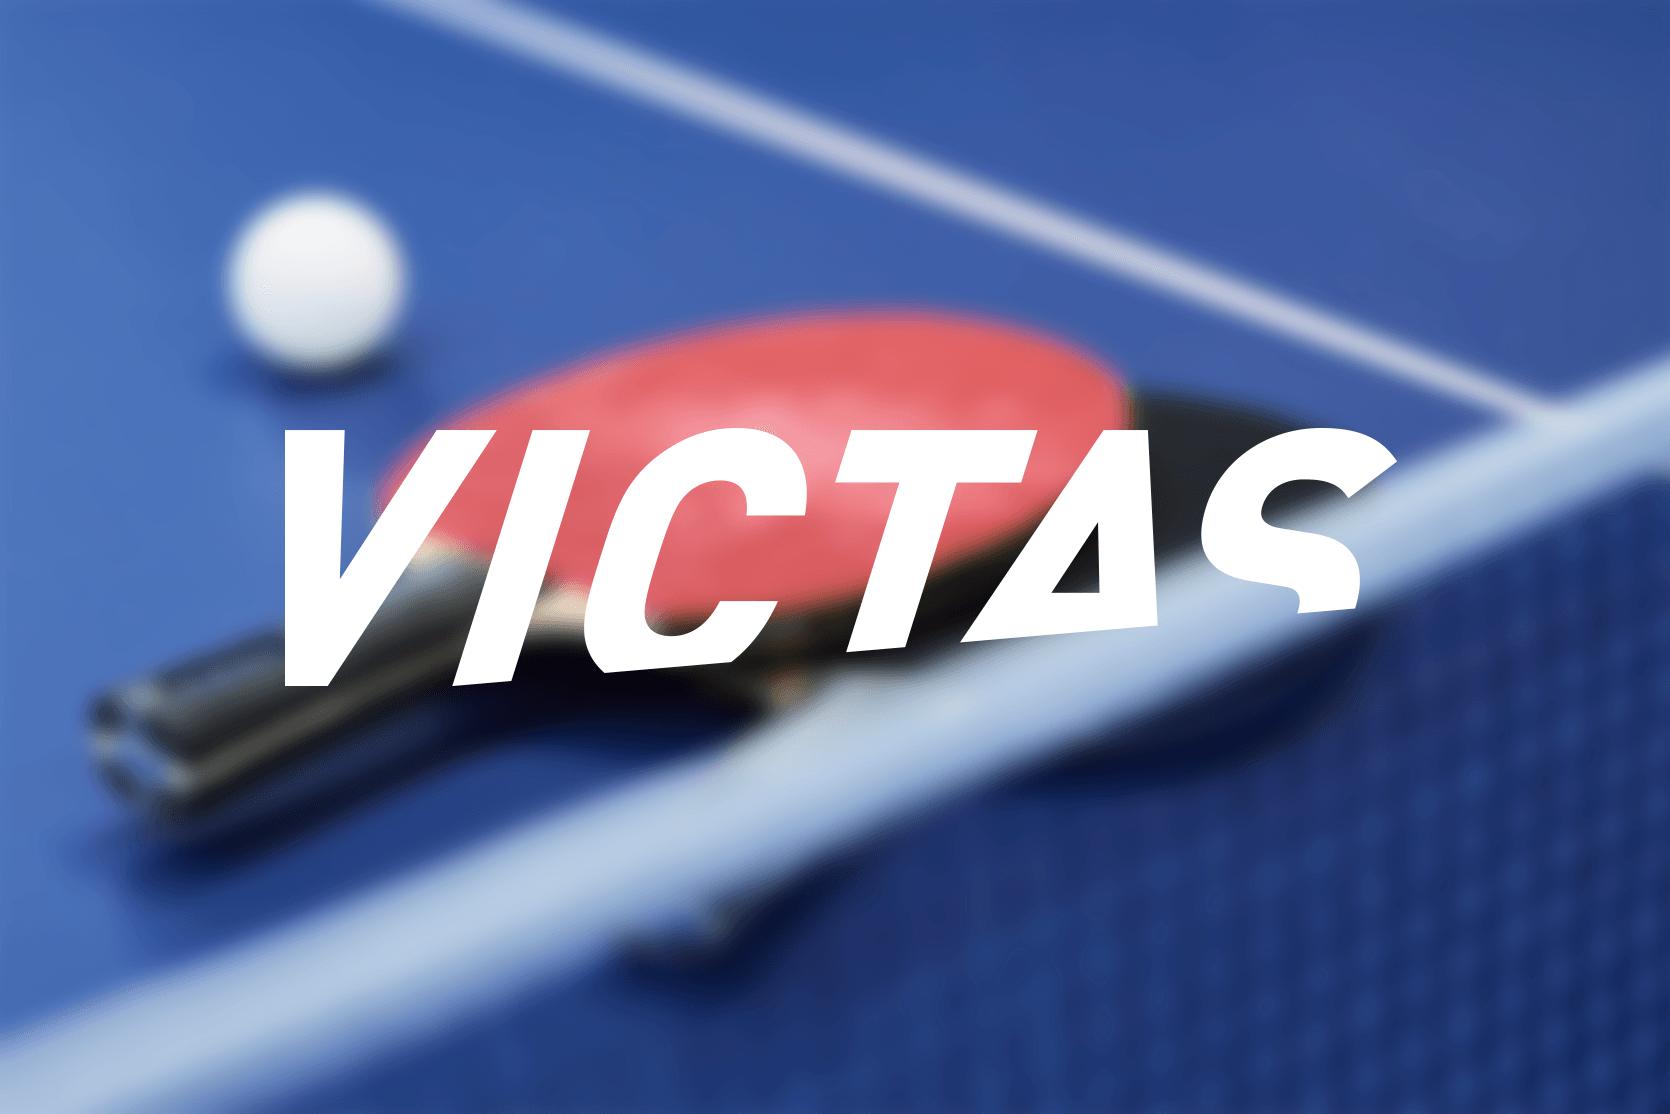 VICTAS T4 MAGOYA VICTAS NAGOYA 卓球